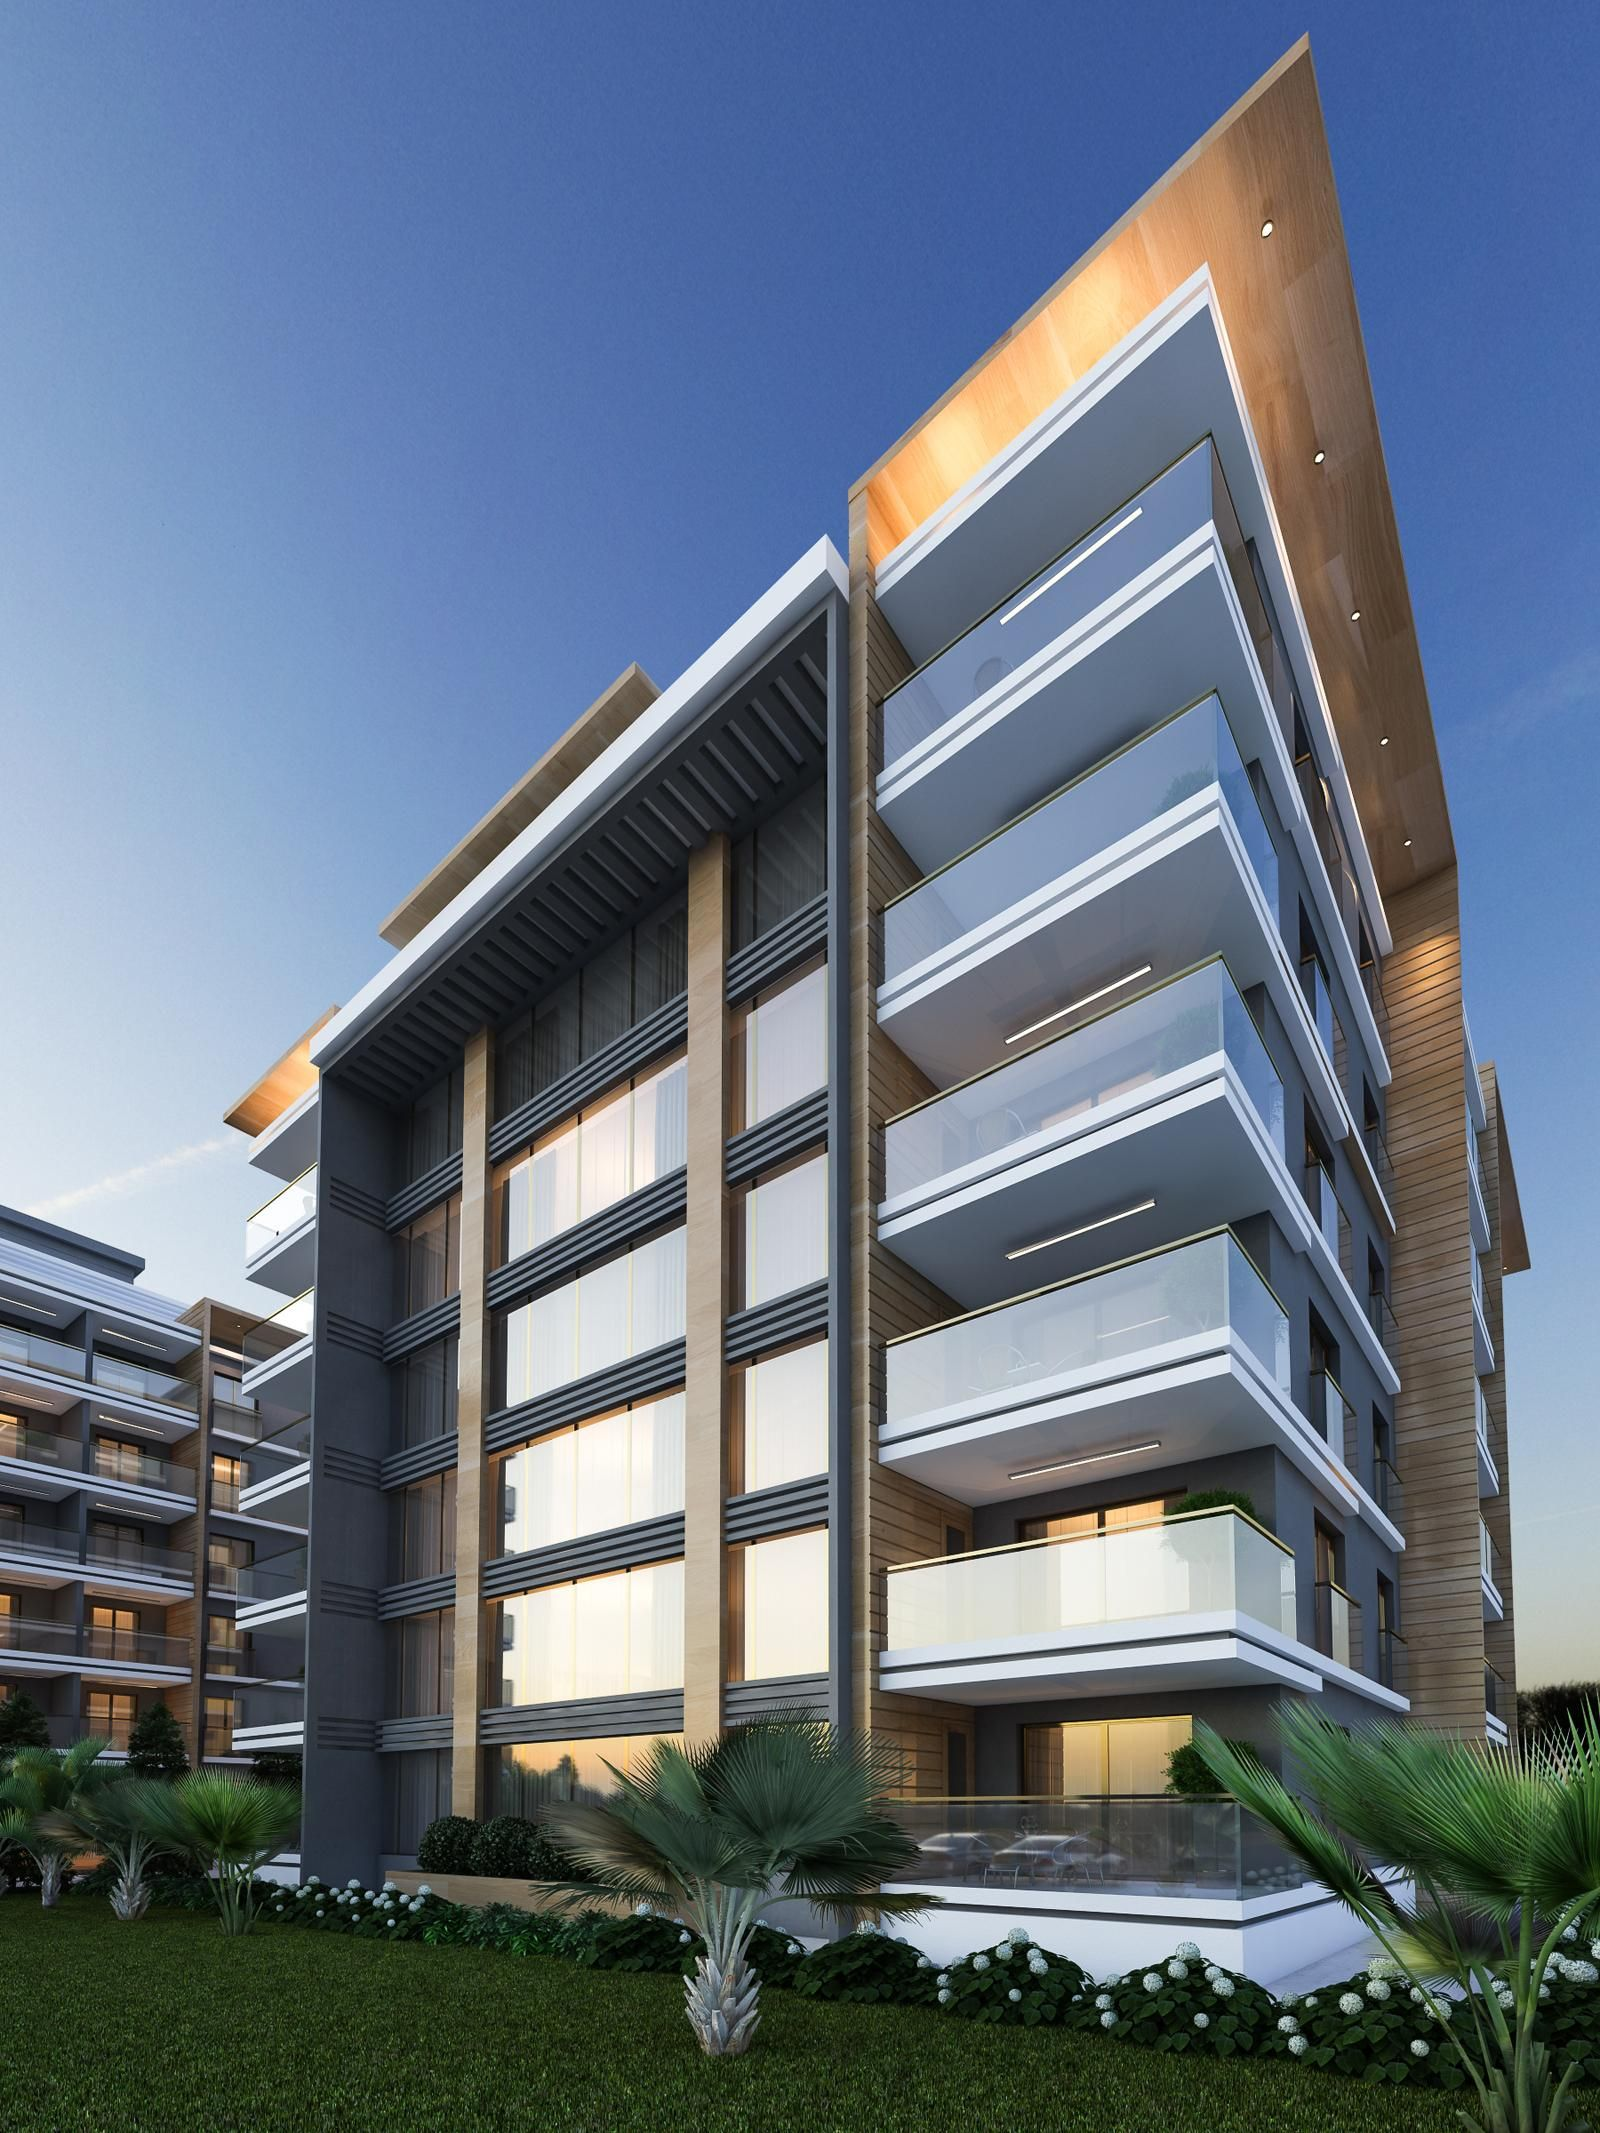 Toprak evler ideias de obra pinterest architecture for Contemporary residential architecture